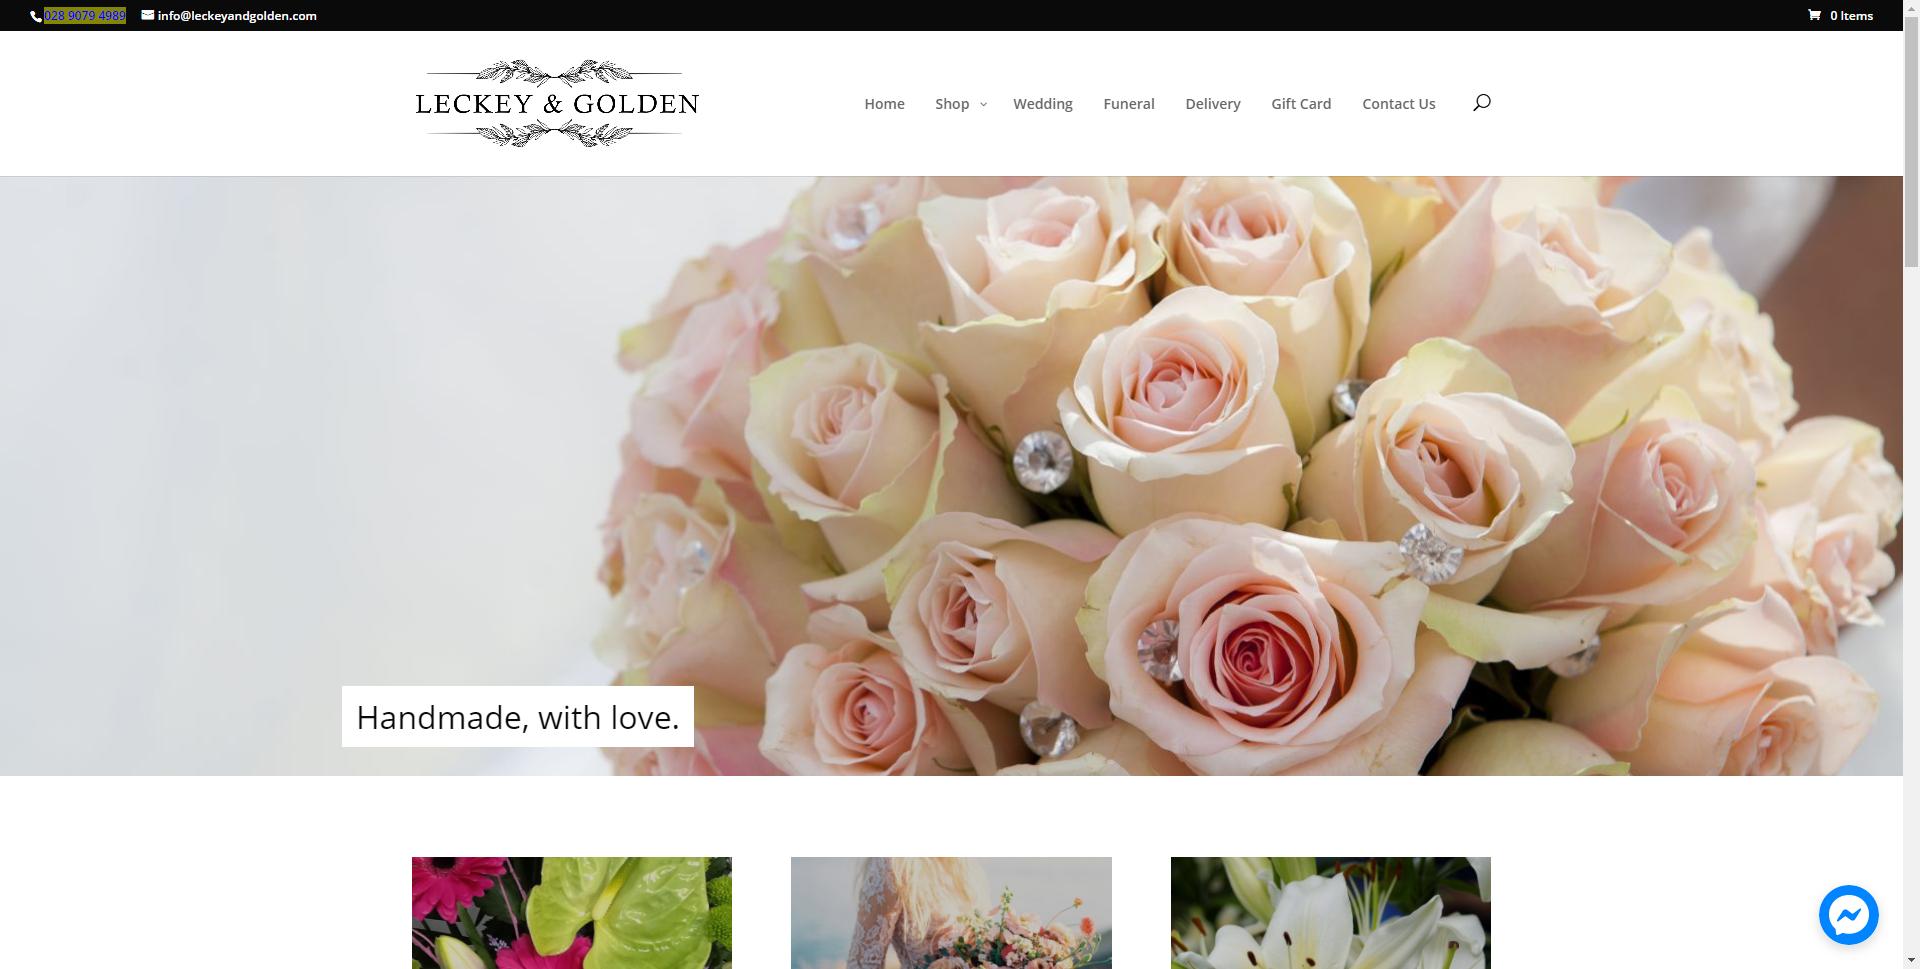 www.leckeyandgolden.com Websites